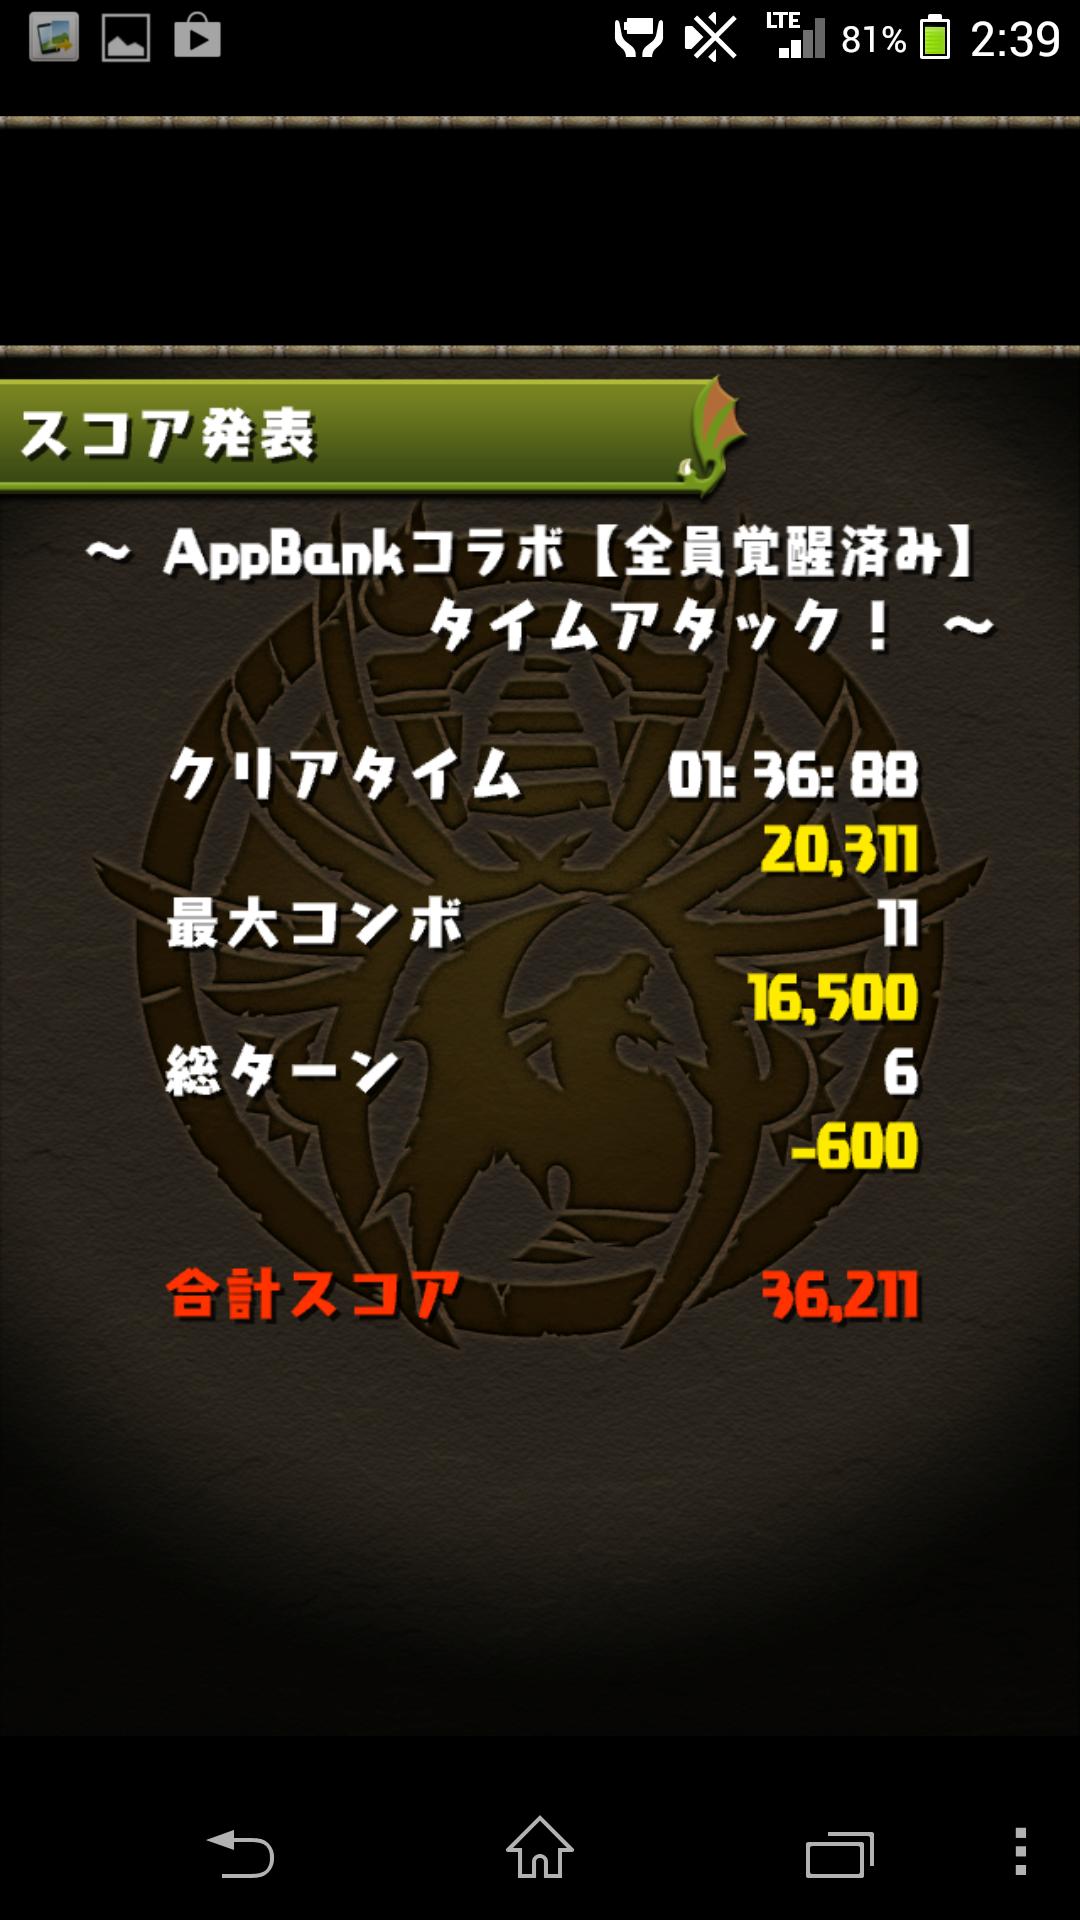 Screenshot_2014-05-02-02-39-33.png